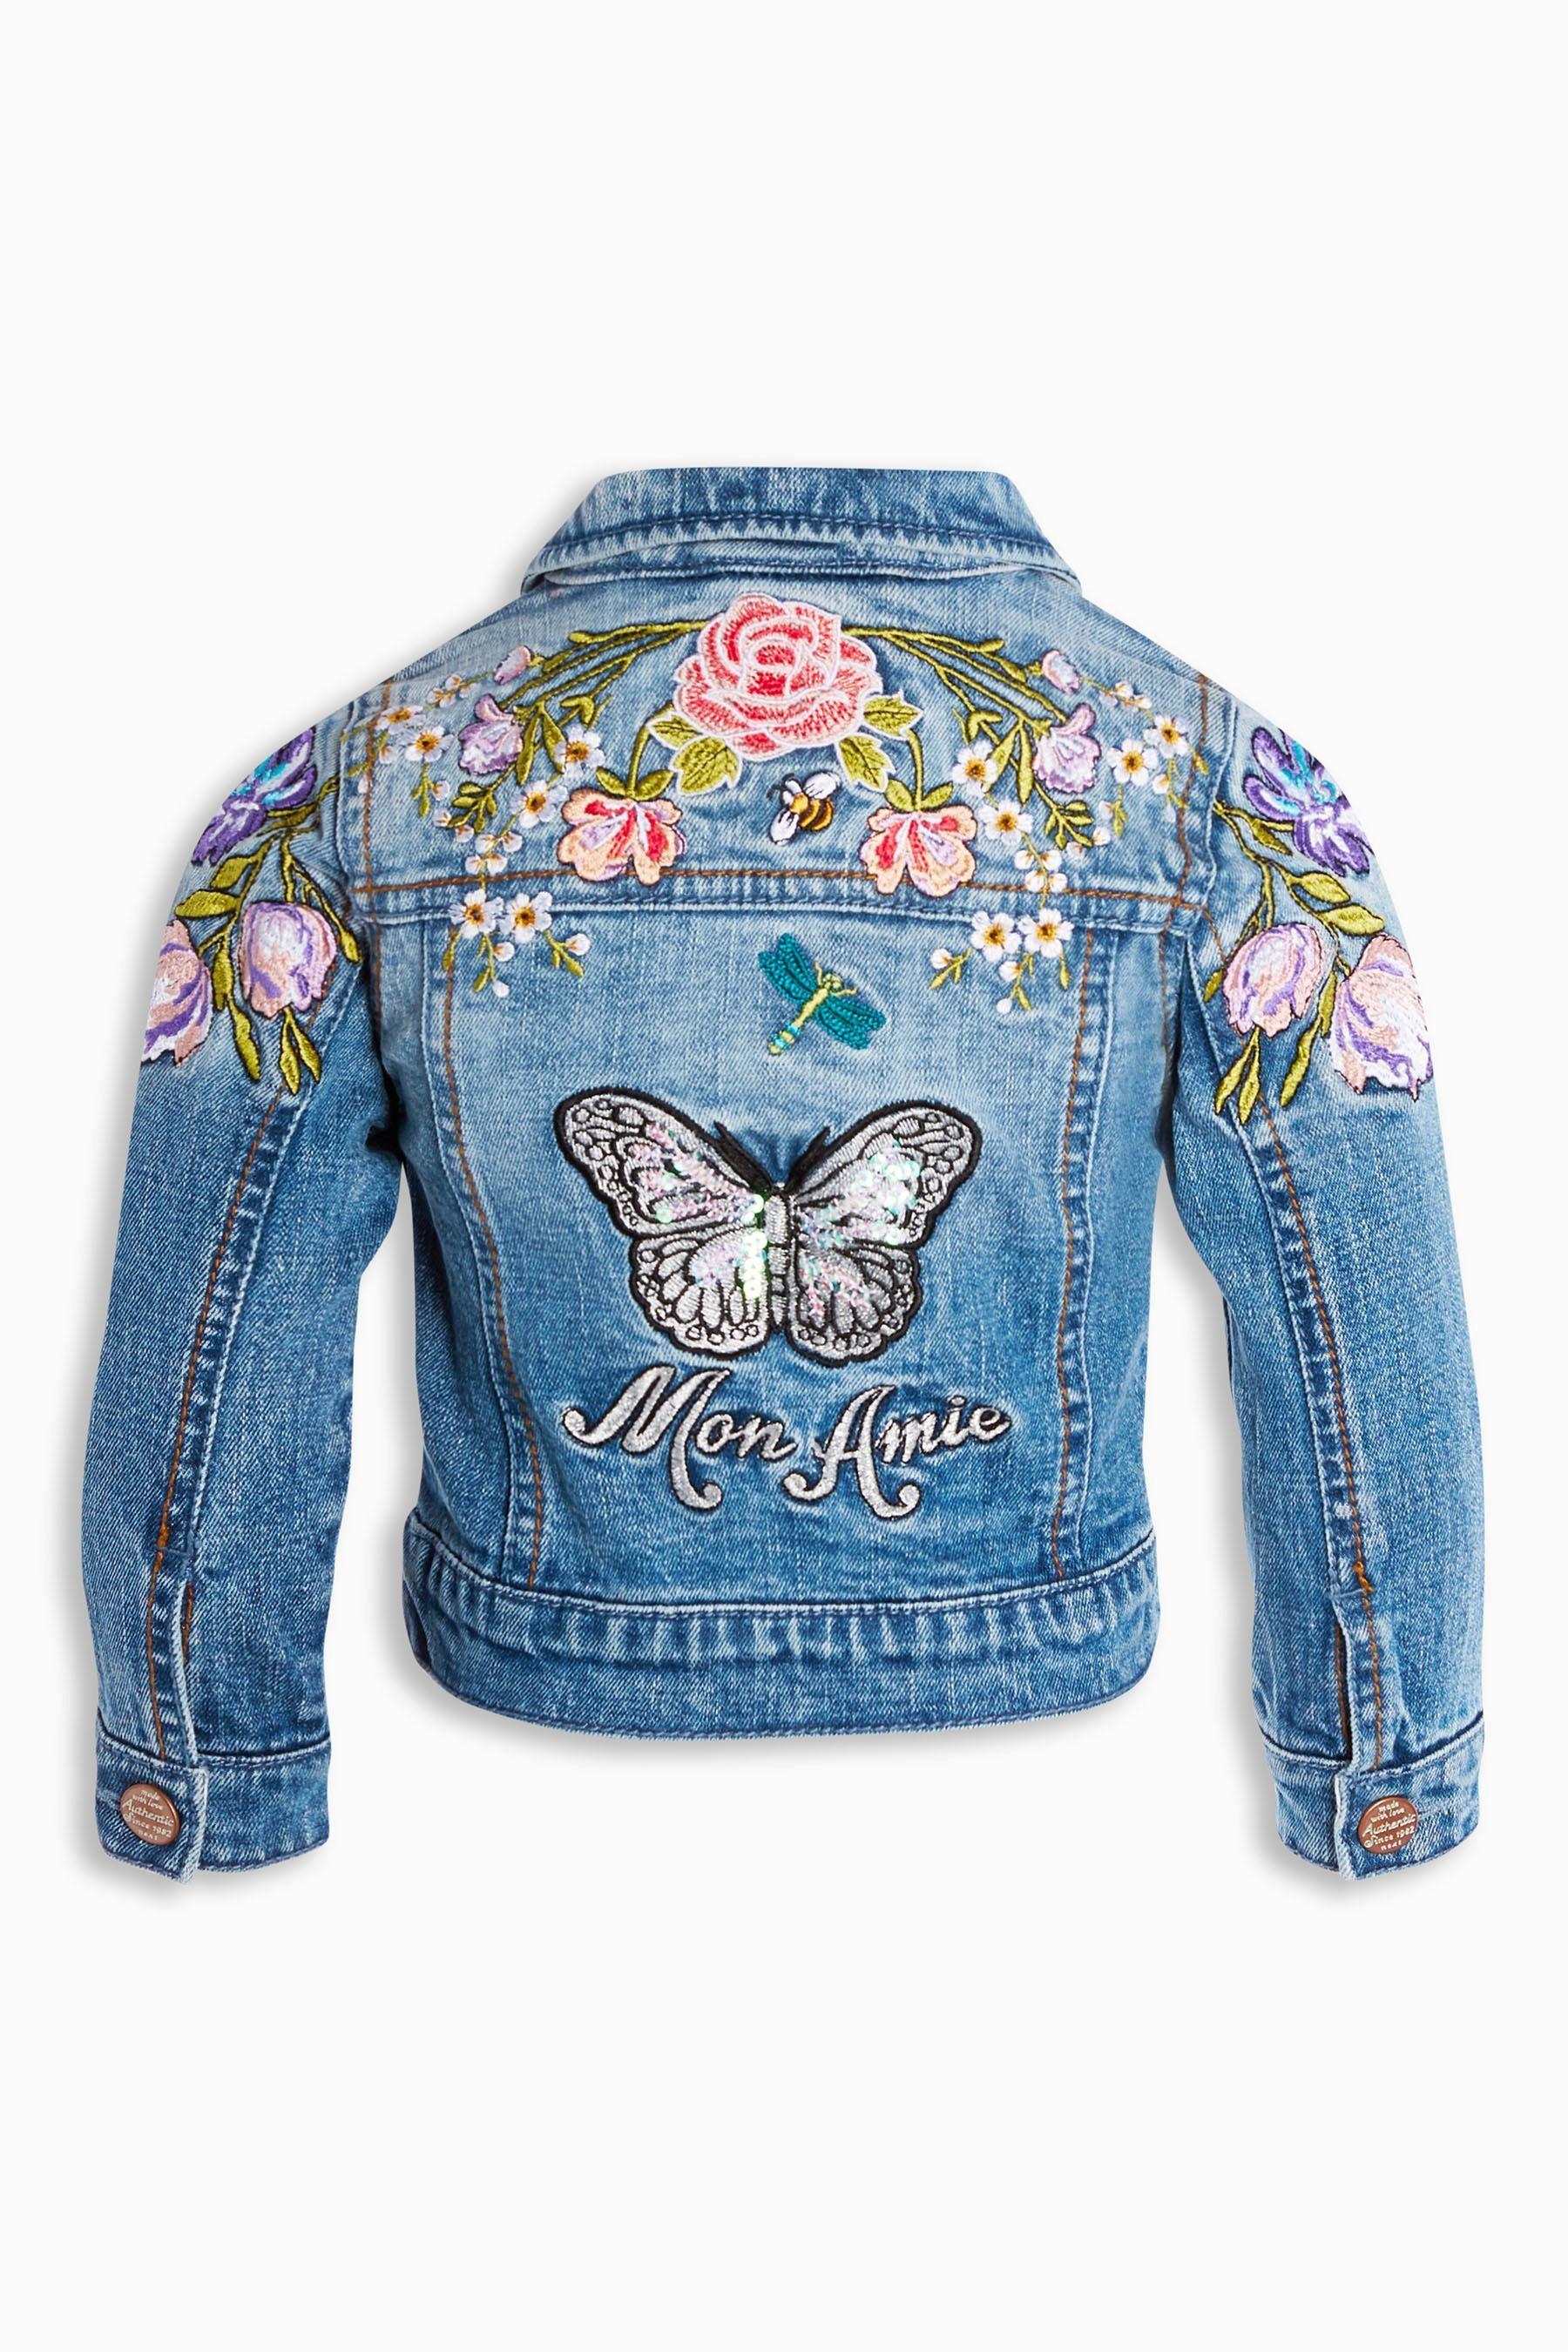 42++ Selling crafts online uk info